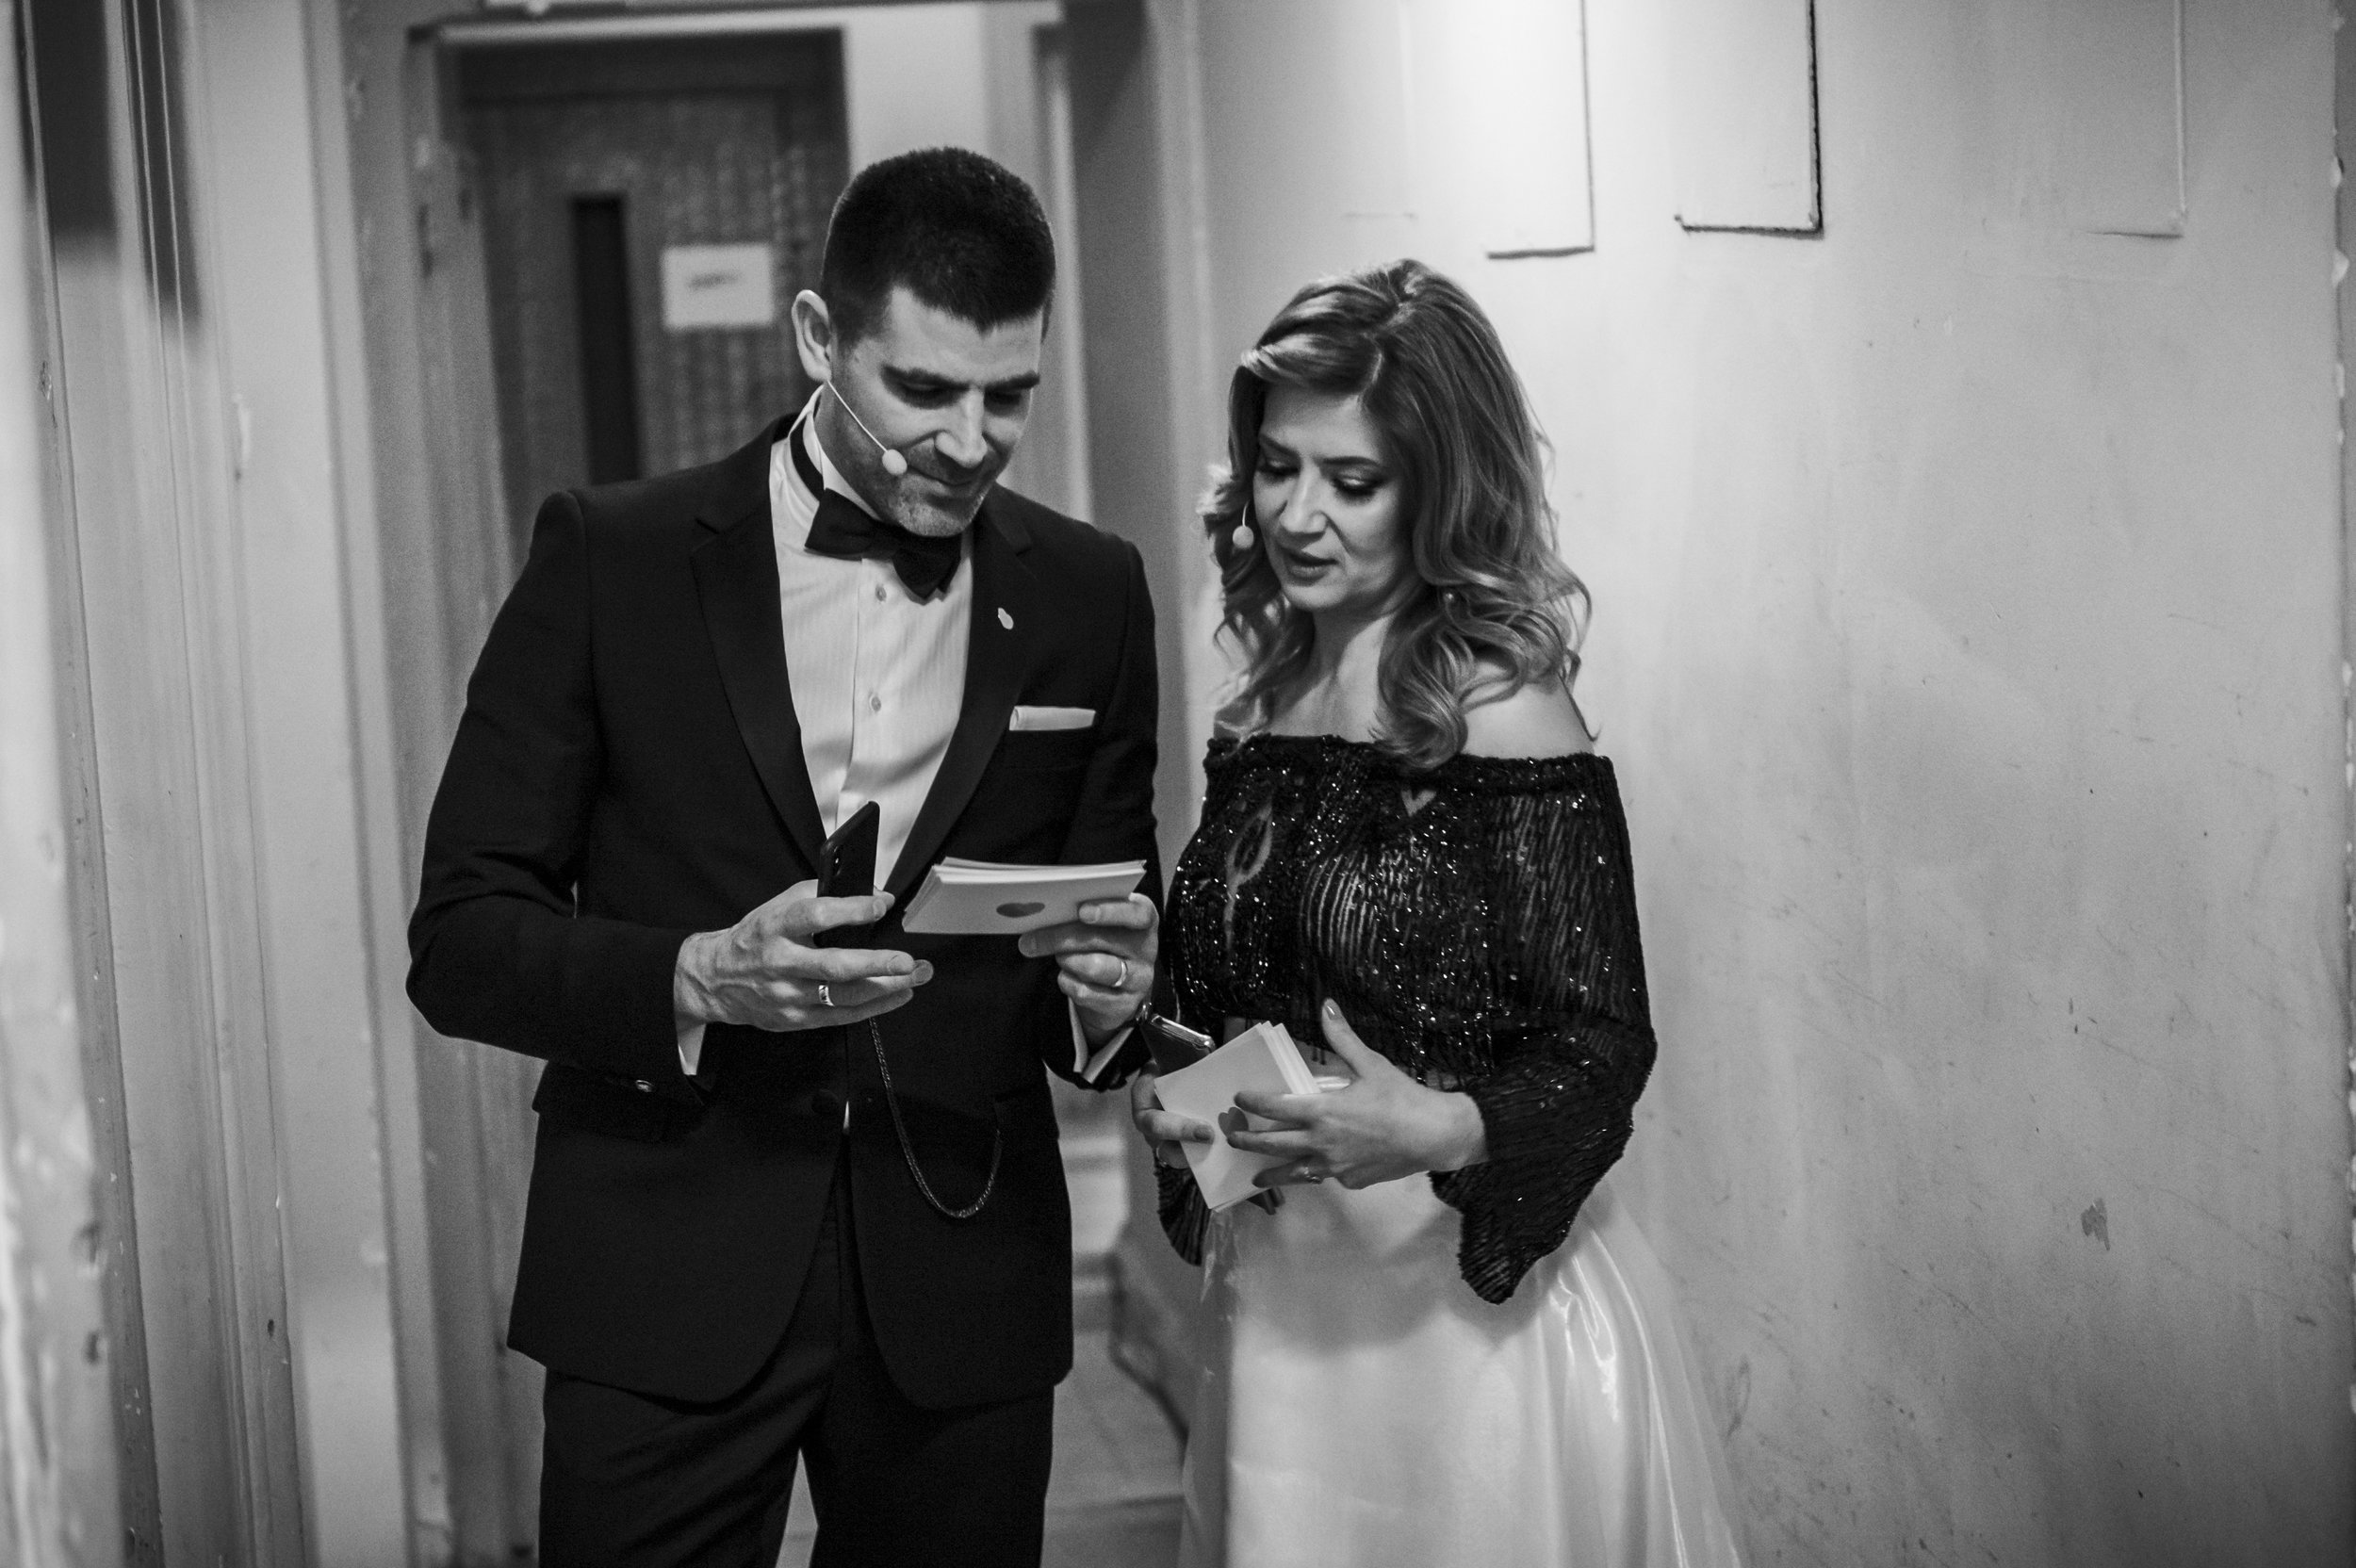 Dragoș Bucurenci_Amalia Enache_Hope Concert 2019_Foto The Storyalist.jpg